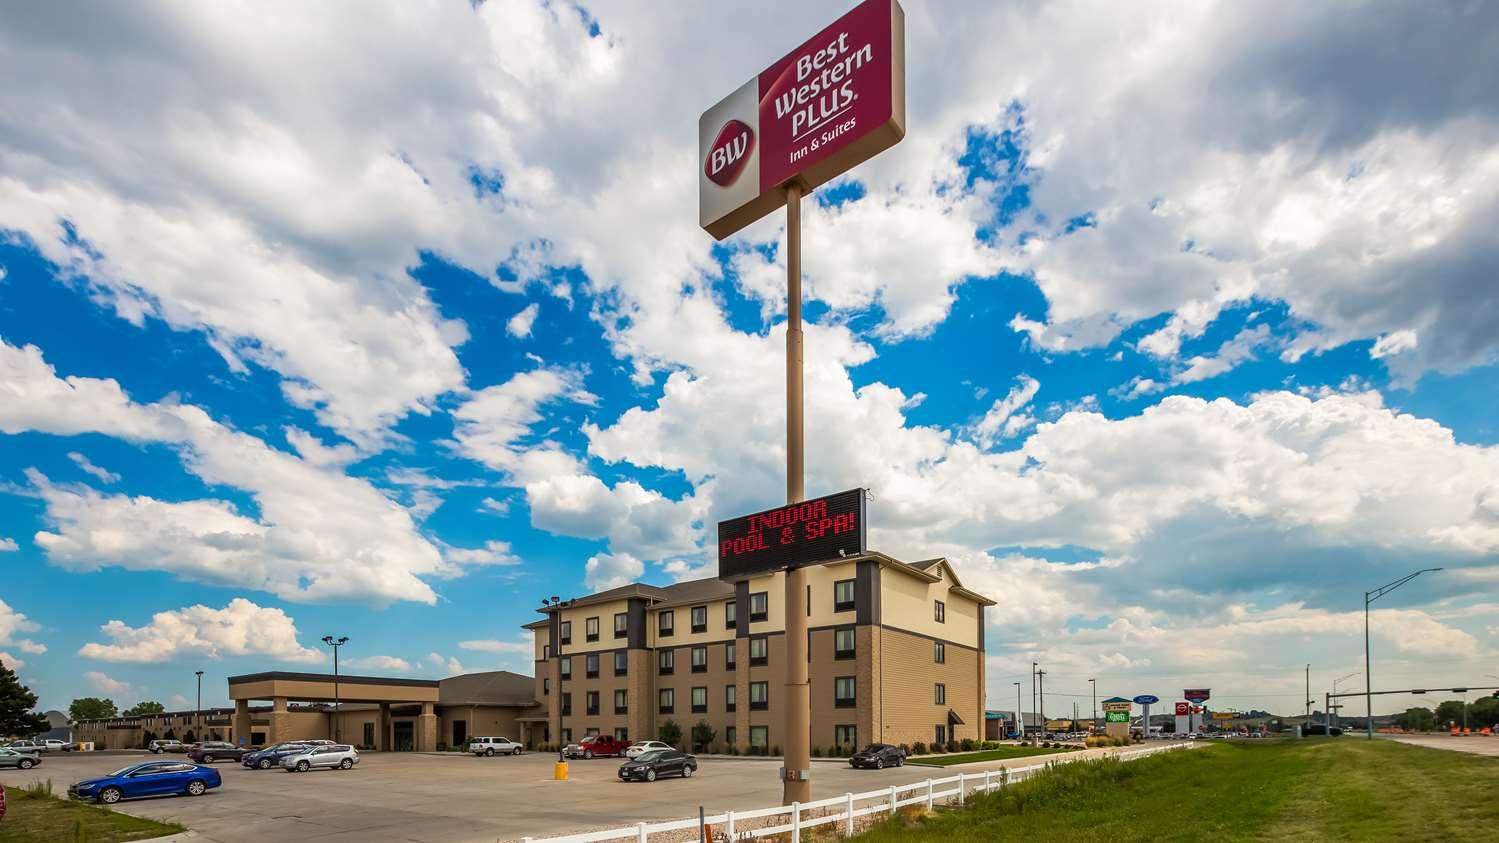 Wilkinson Development, Best Western Plus, Best Western, Hotel, Motel, Lodging, sponsorship, north platte area sports commission, play north platte, north platte, nebraska, ne